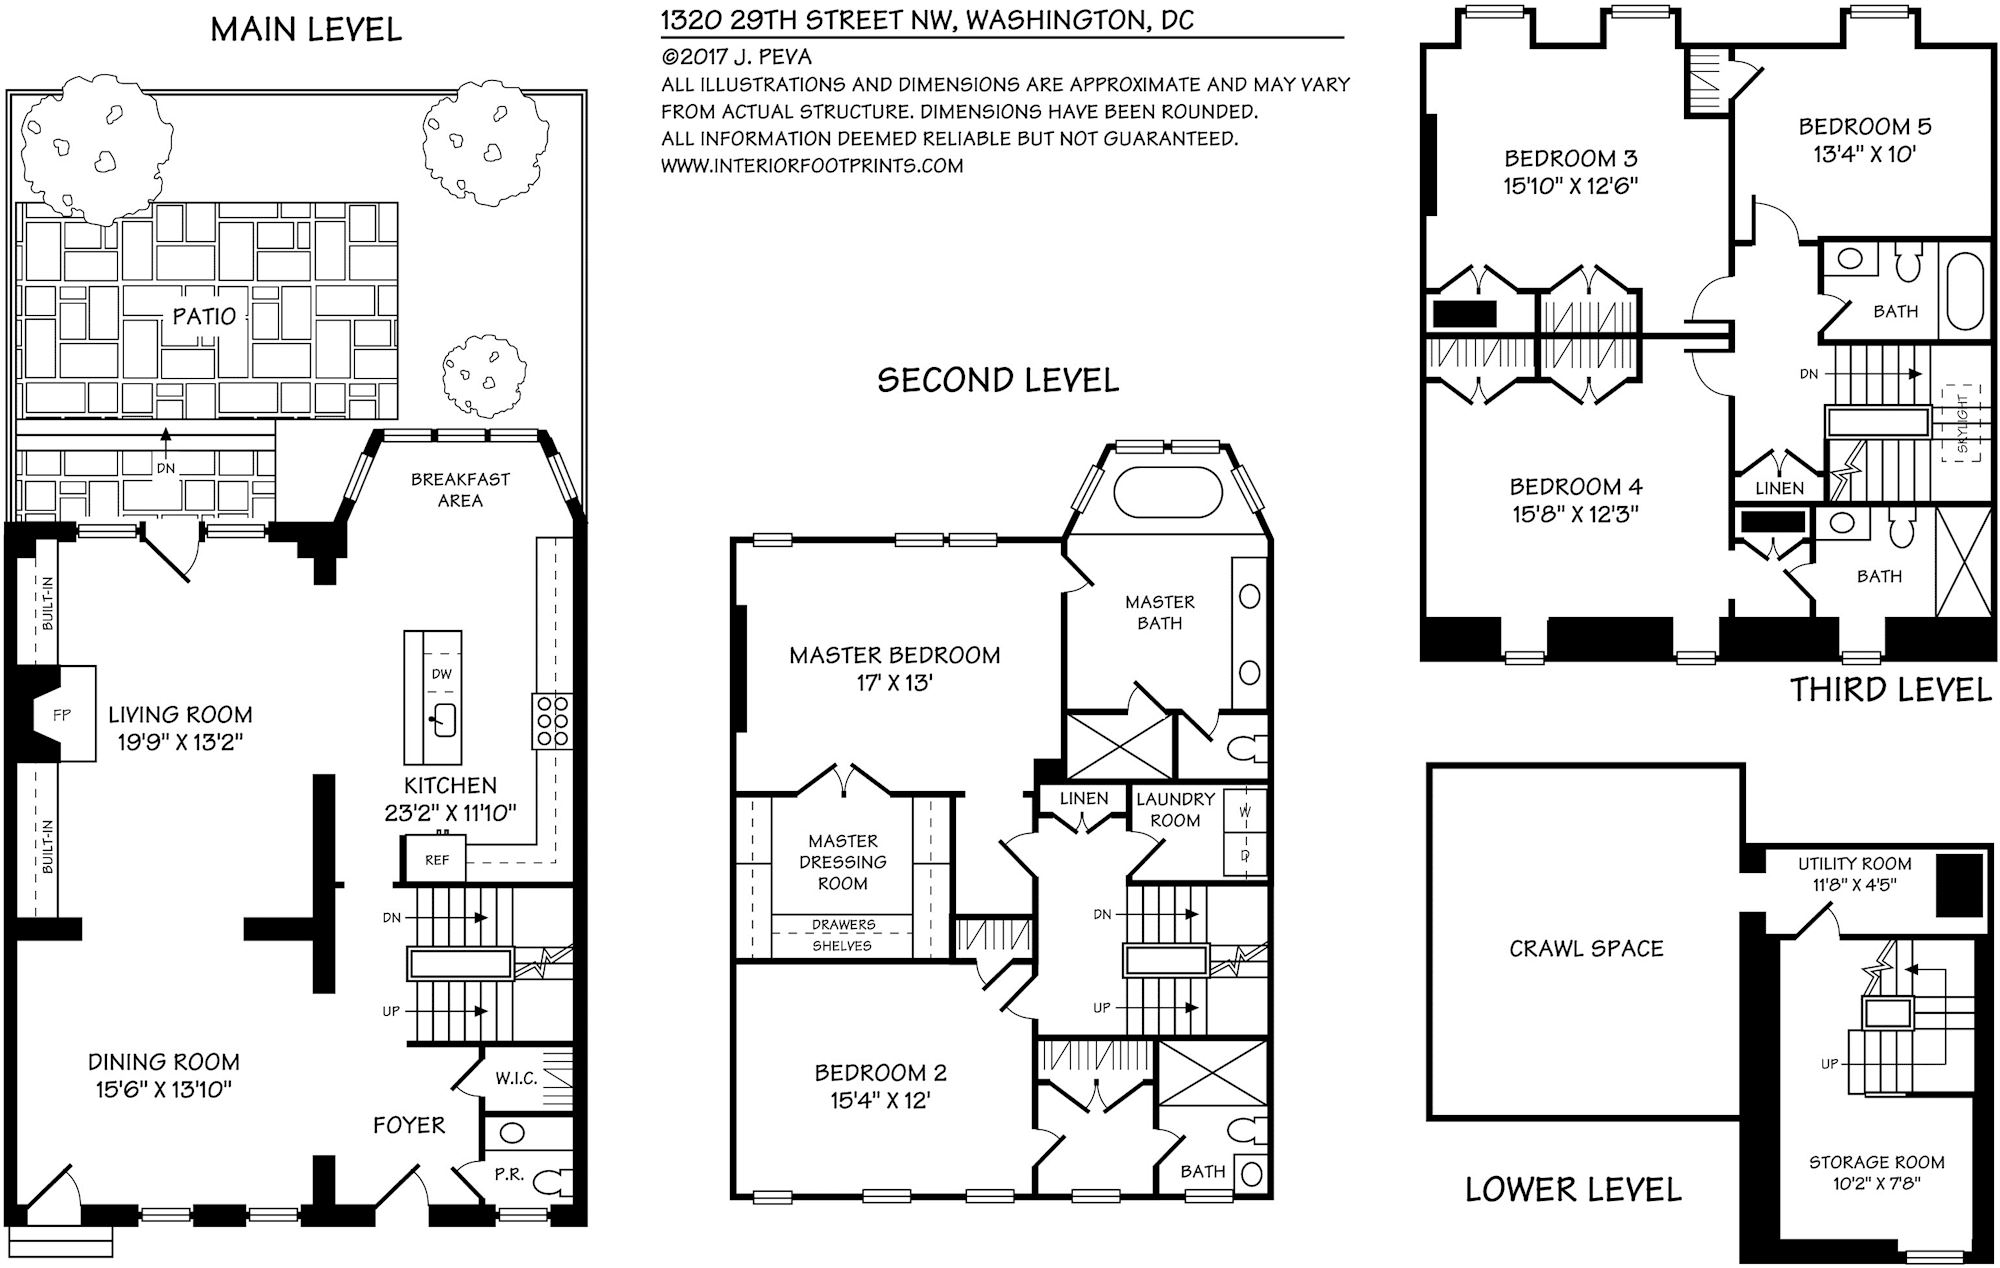 100 Fine Dining Floor Plan Washington